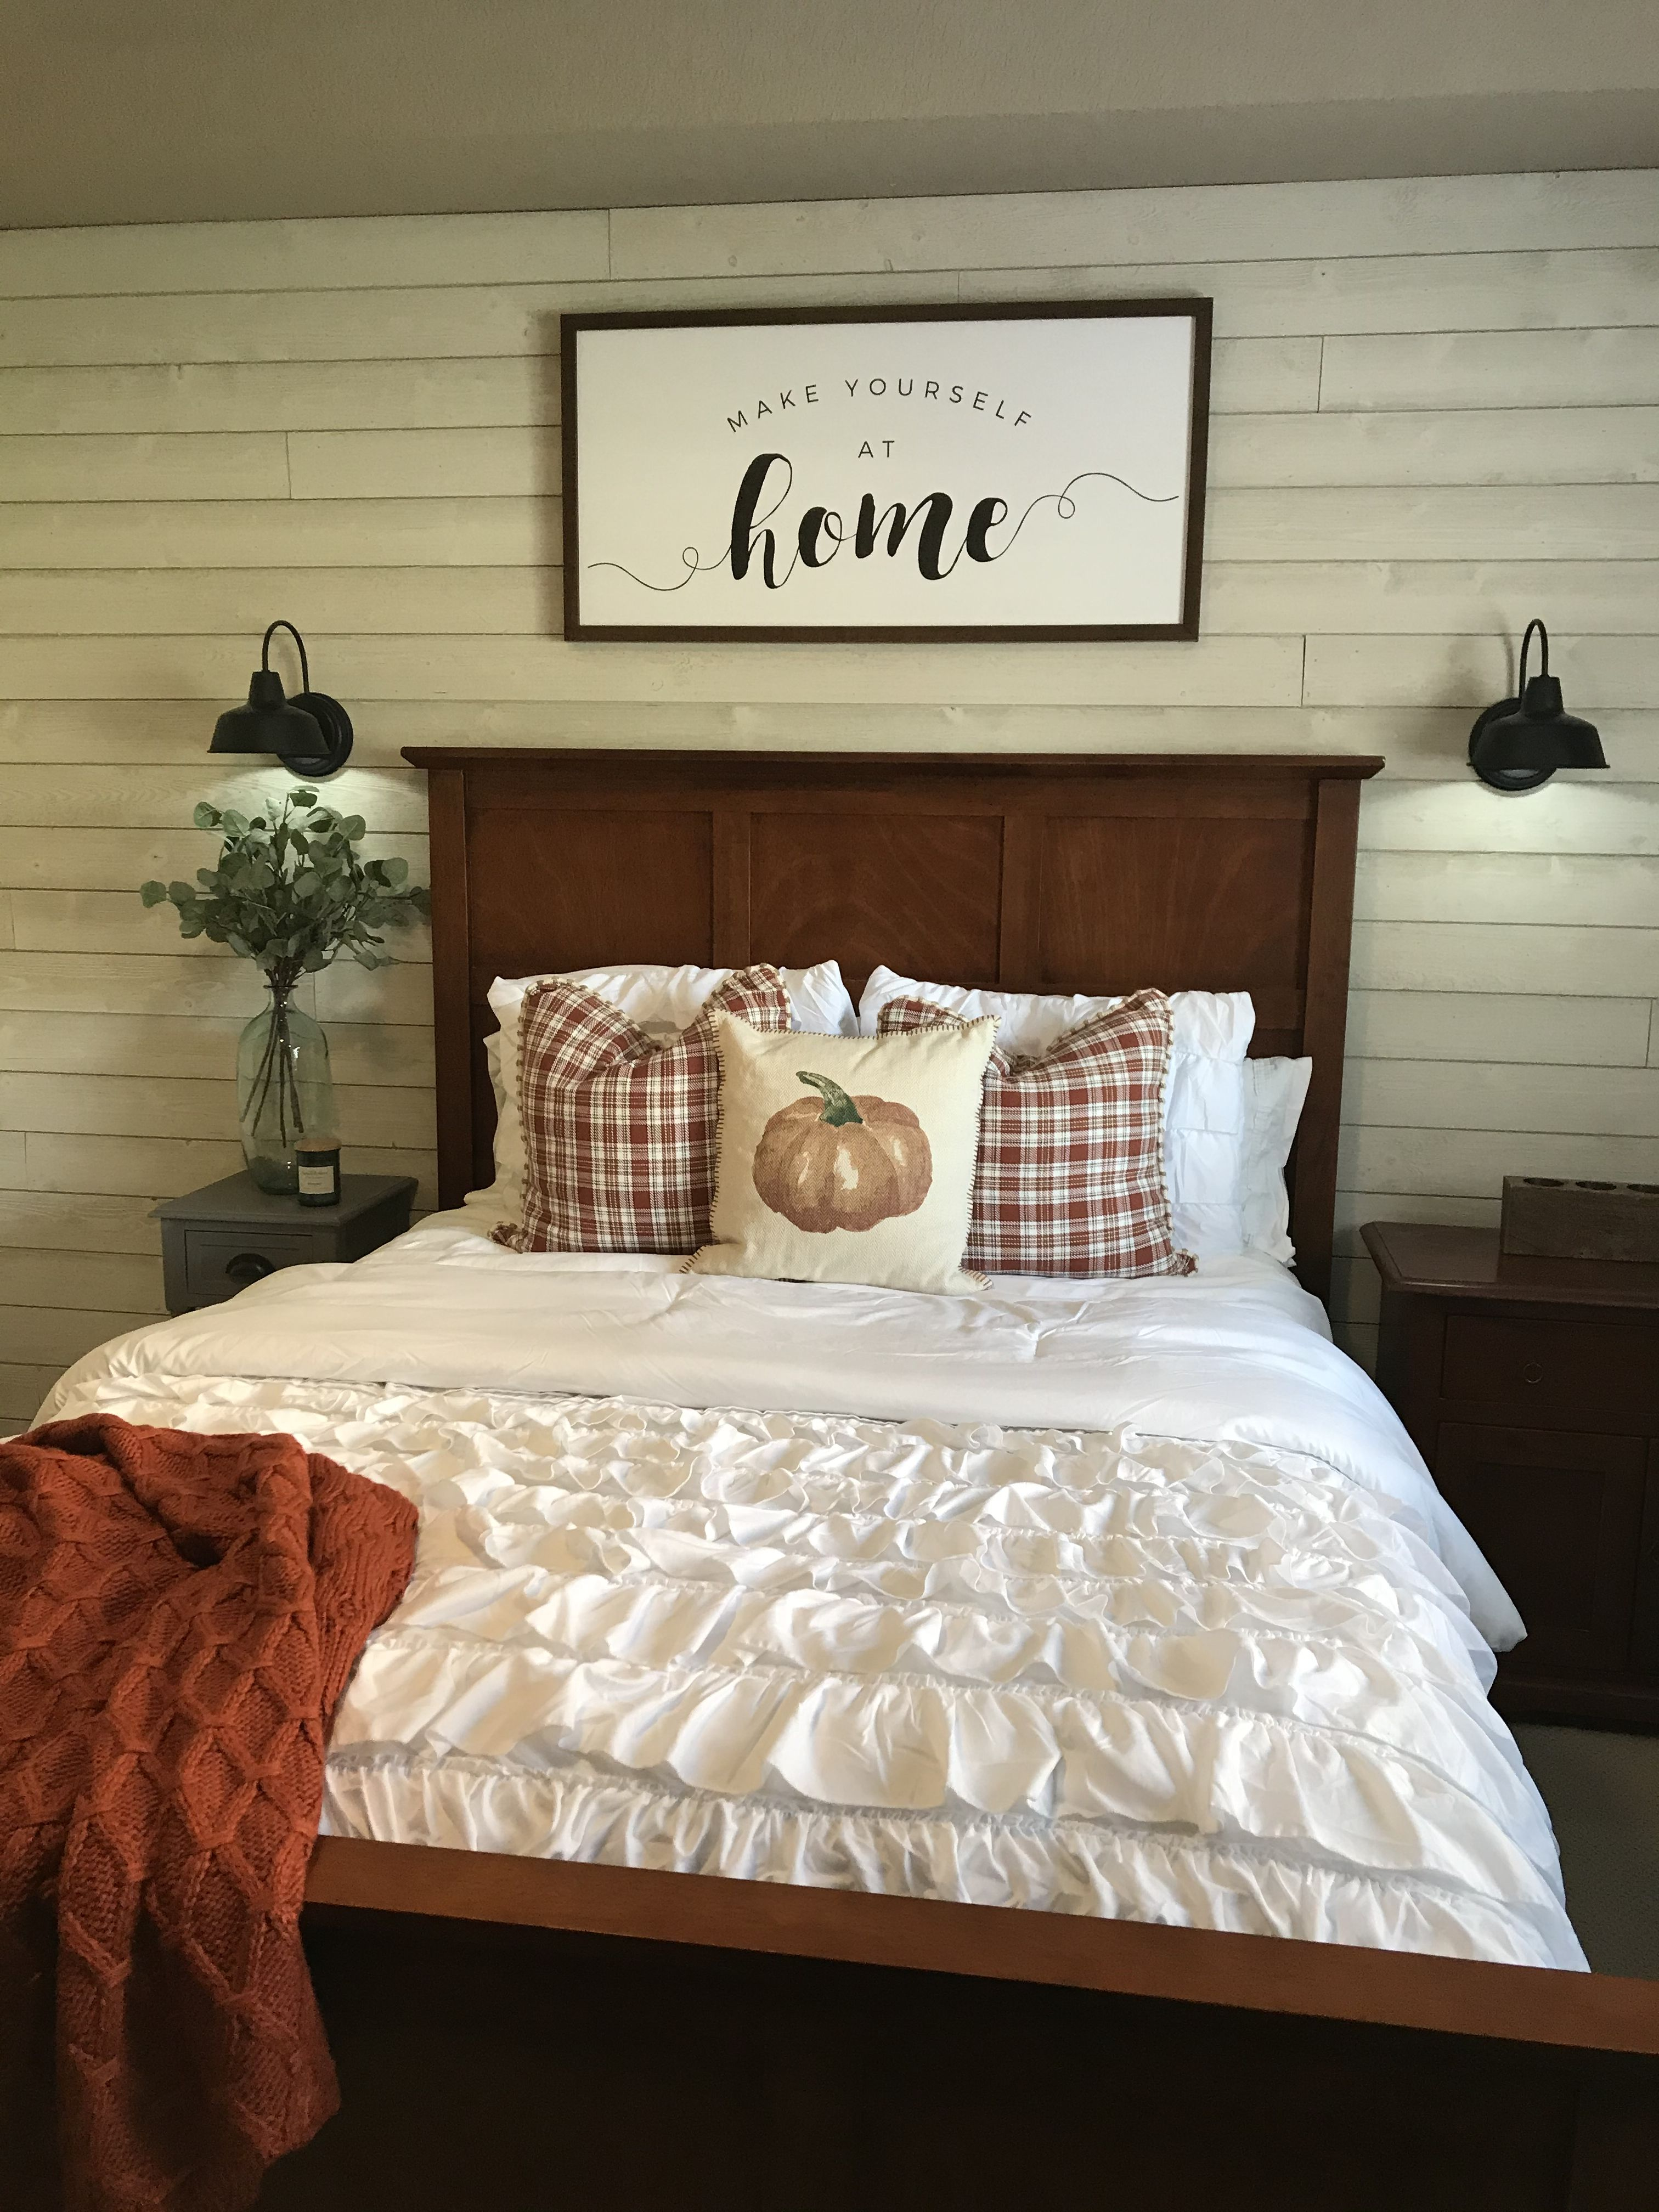 Shiplap wall, wireless sconces, comfy farmhouse decor